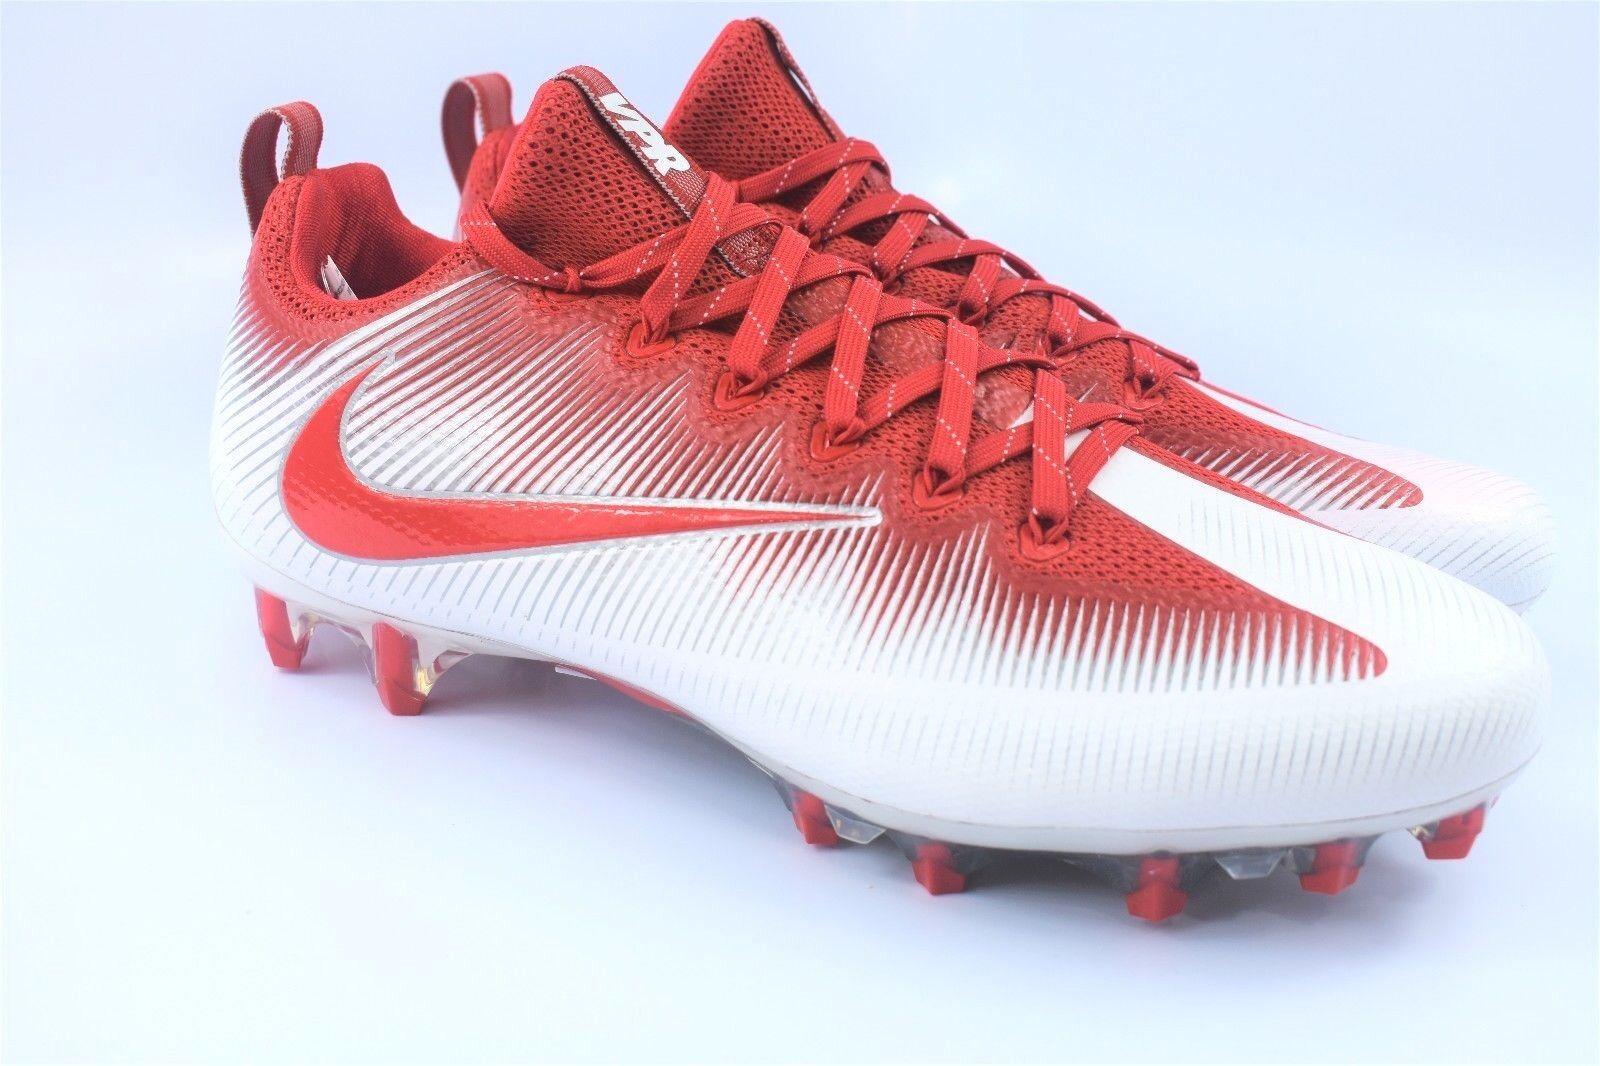 9d223fcdd83 NIKE Vapor Untouchable Football Cleats Size 12.5 Red orange White 844816-180